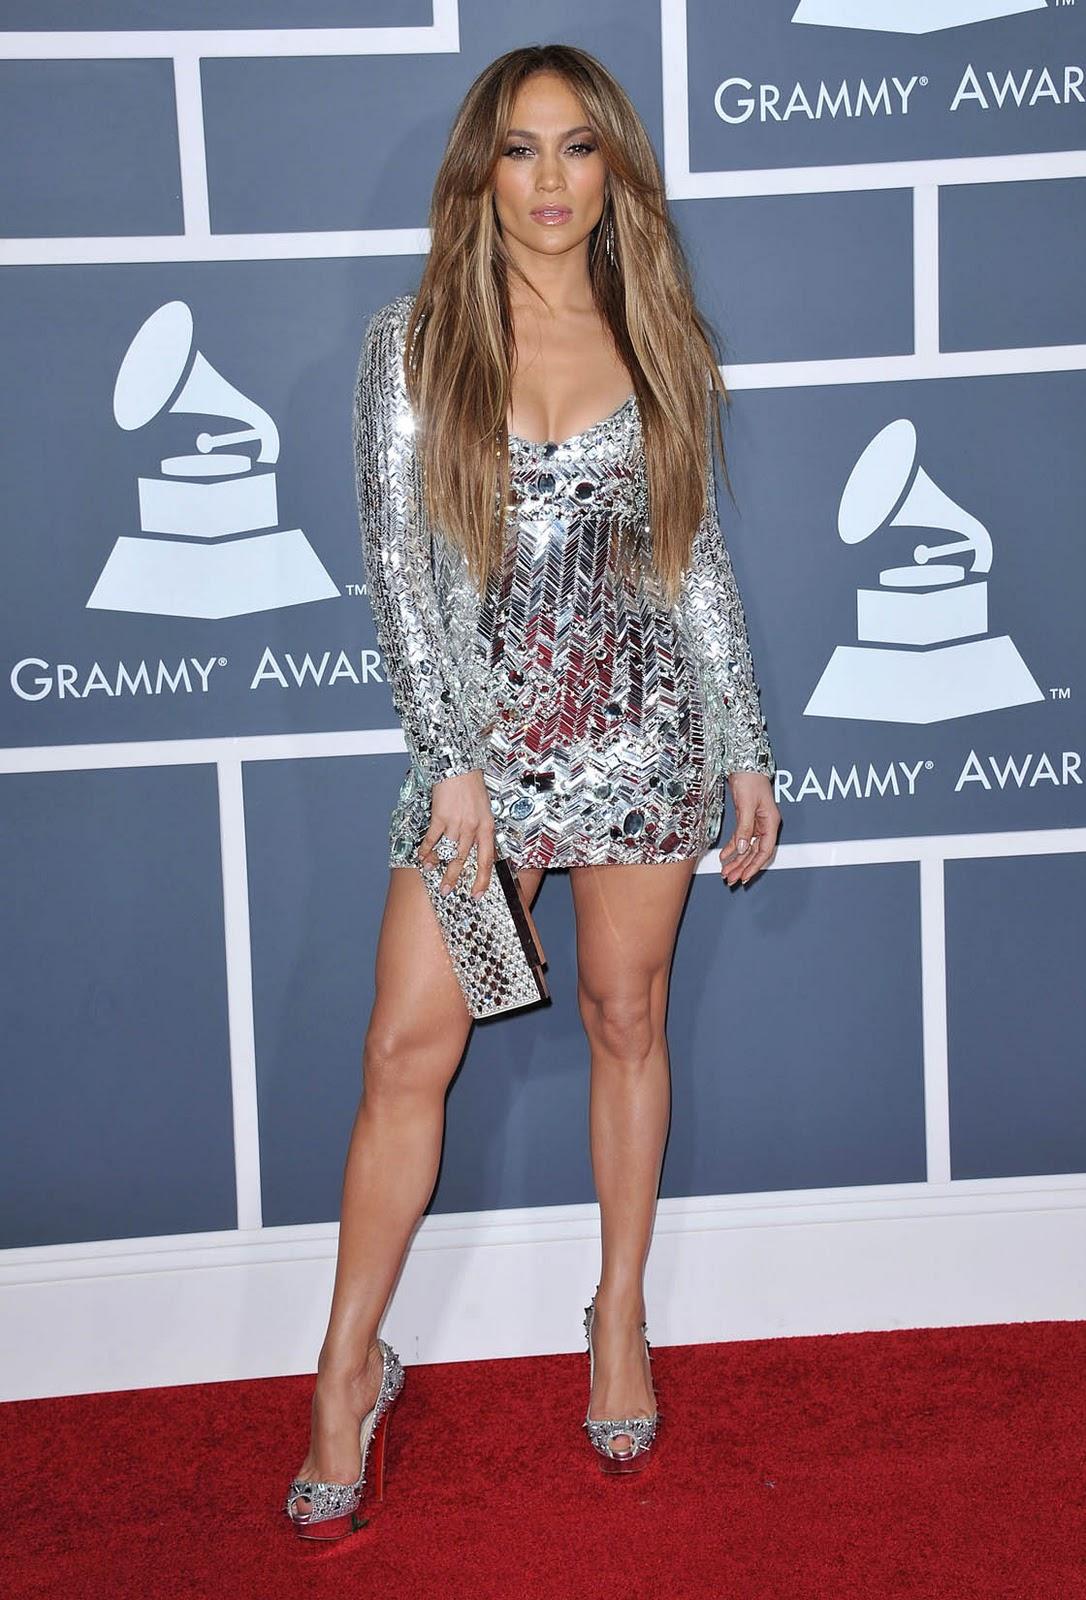 http://1.bp.blogspot.com/-L7G7UtWDHAE/TVohxvEn-LI/AAAAAAAAGlM/R-rInj-aRsc/s1600/jennifer_lopez_grammy_dress_5.jpg